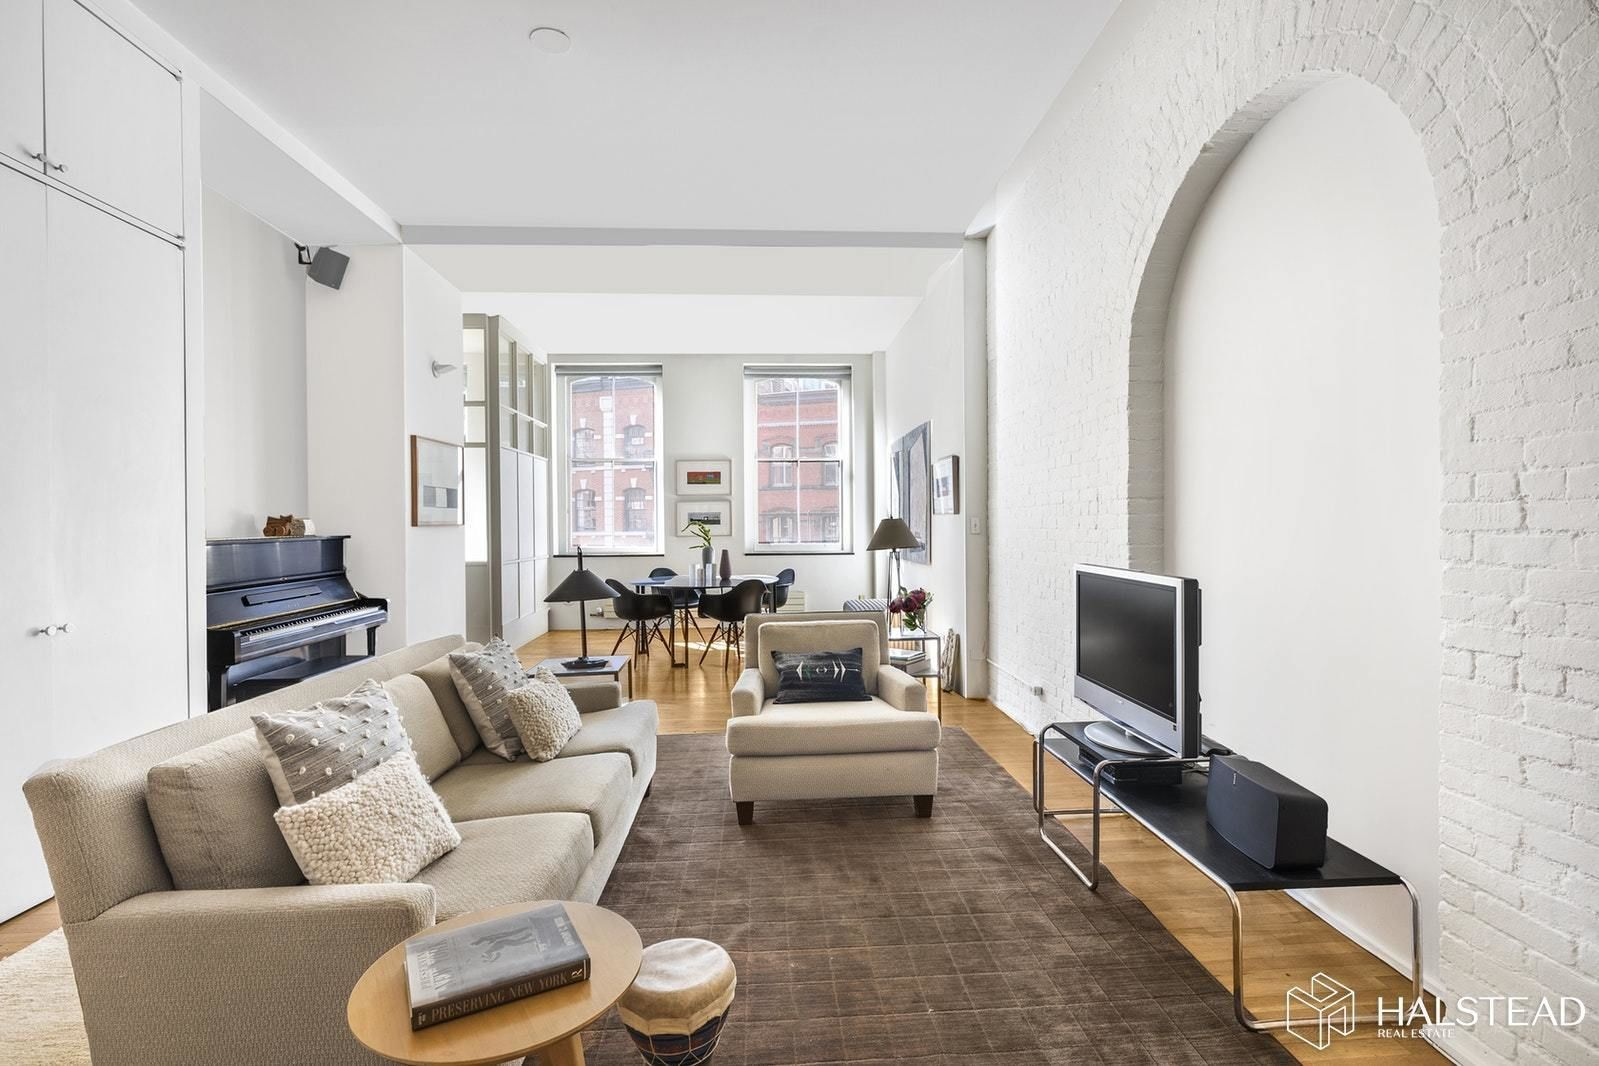 Apartment for sale at 177 Duane Street, Apt 4E